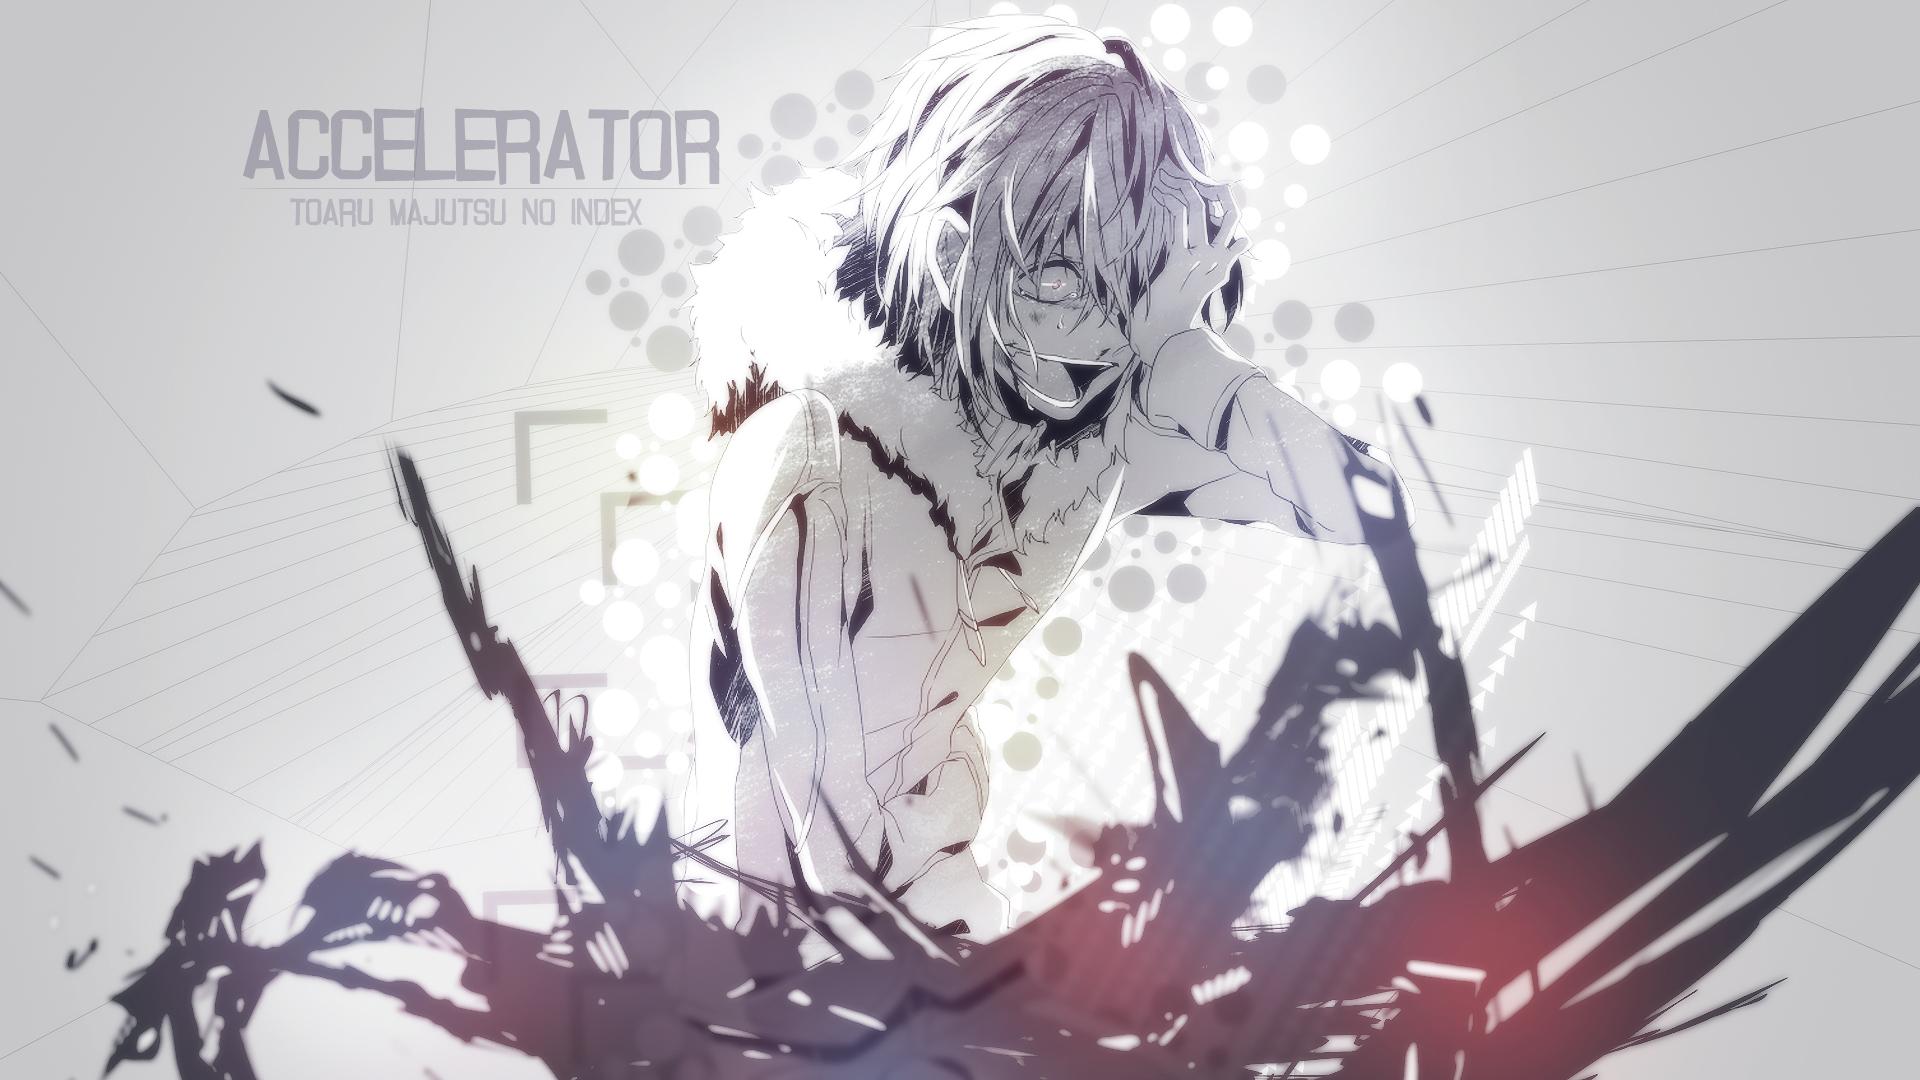 Accelerator Toaru Majutsu No Index By JuliannMiic